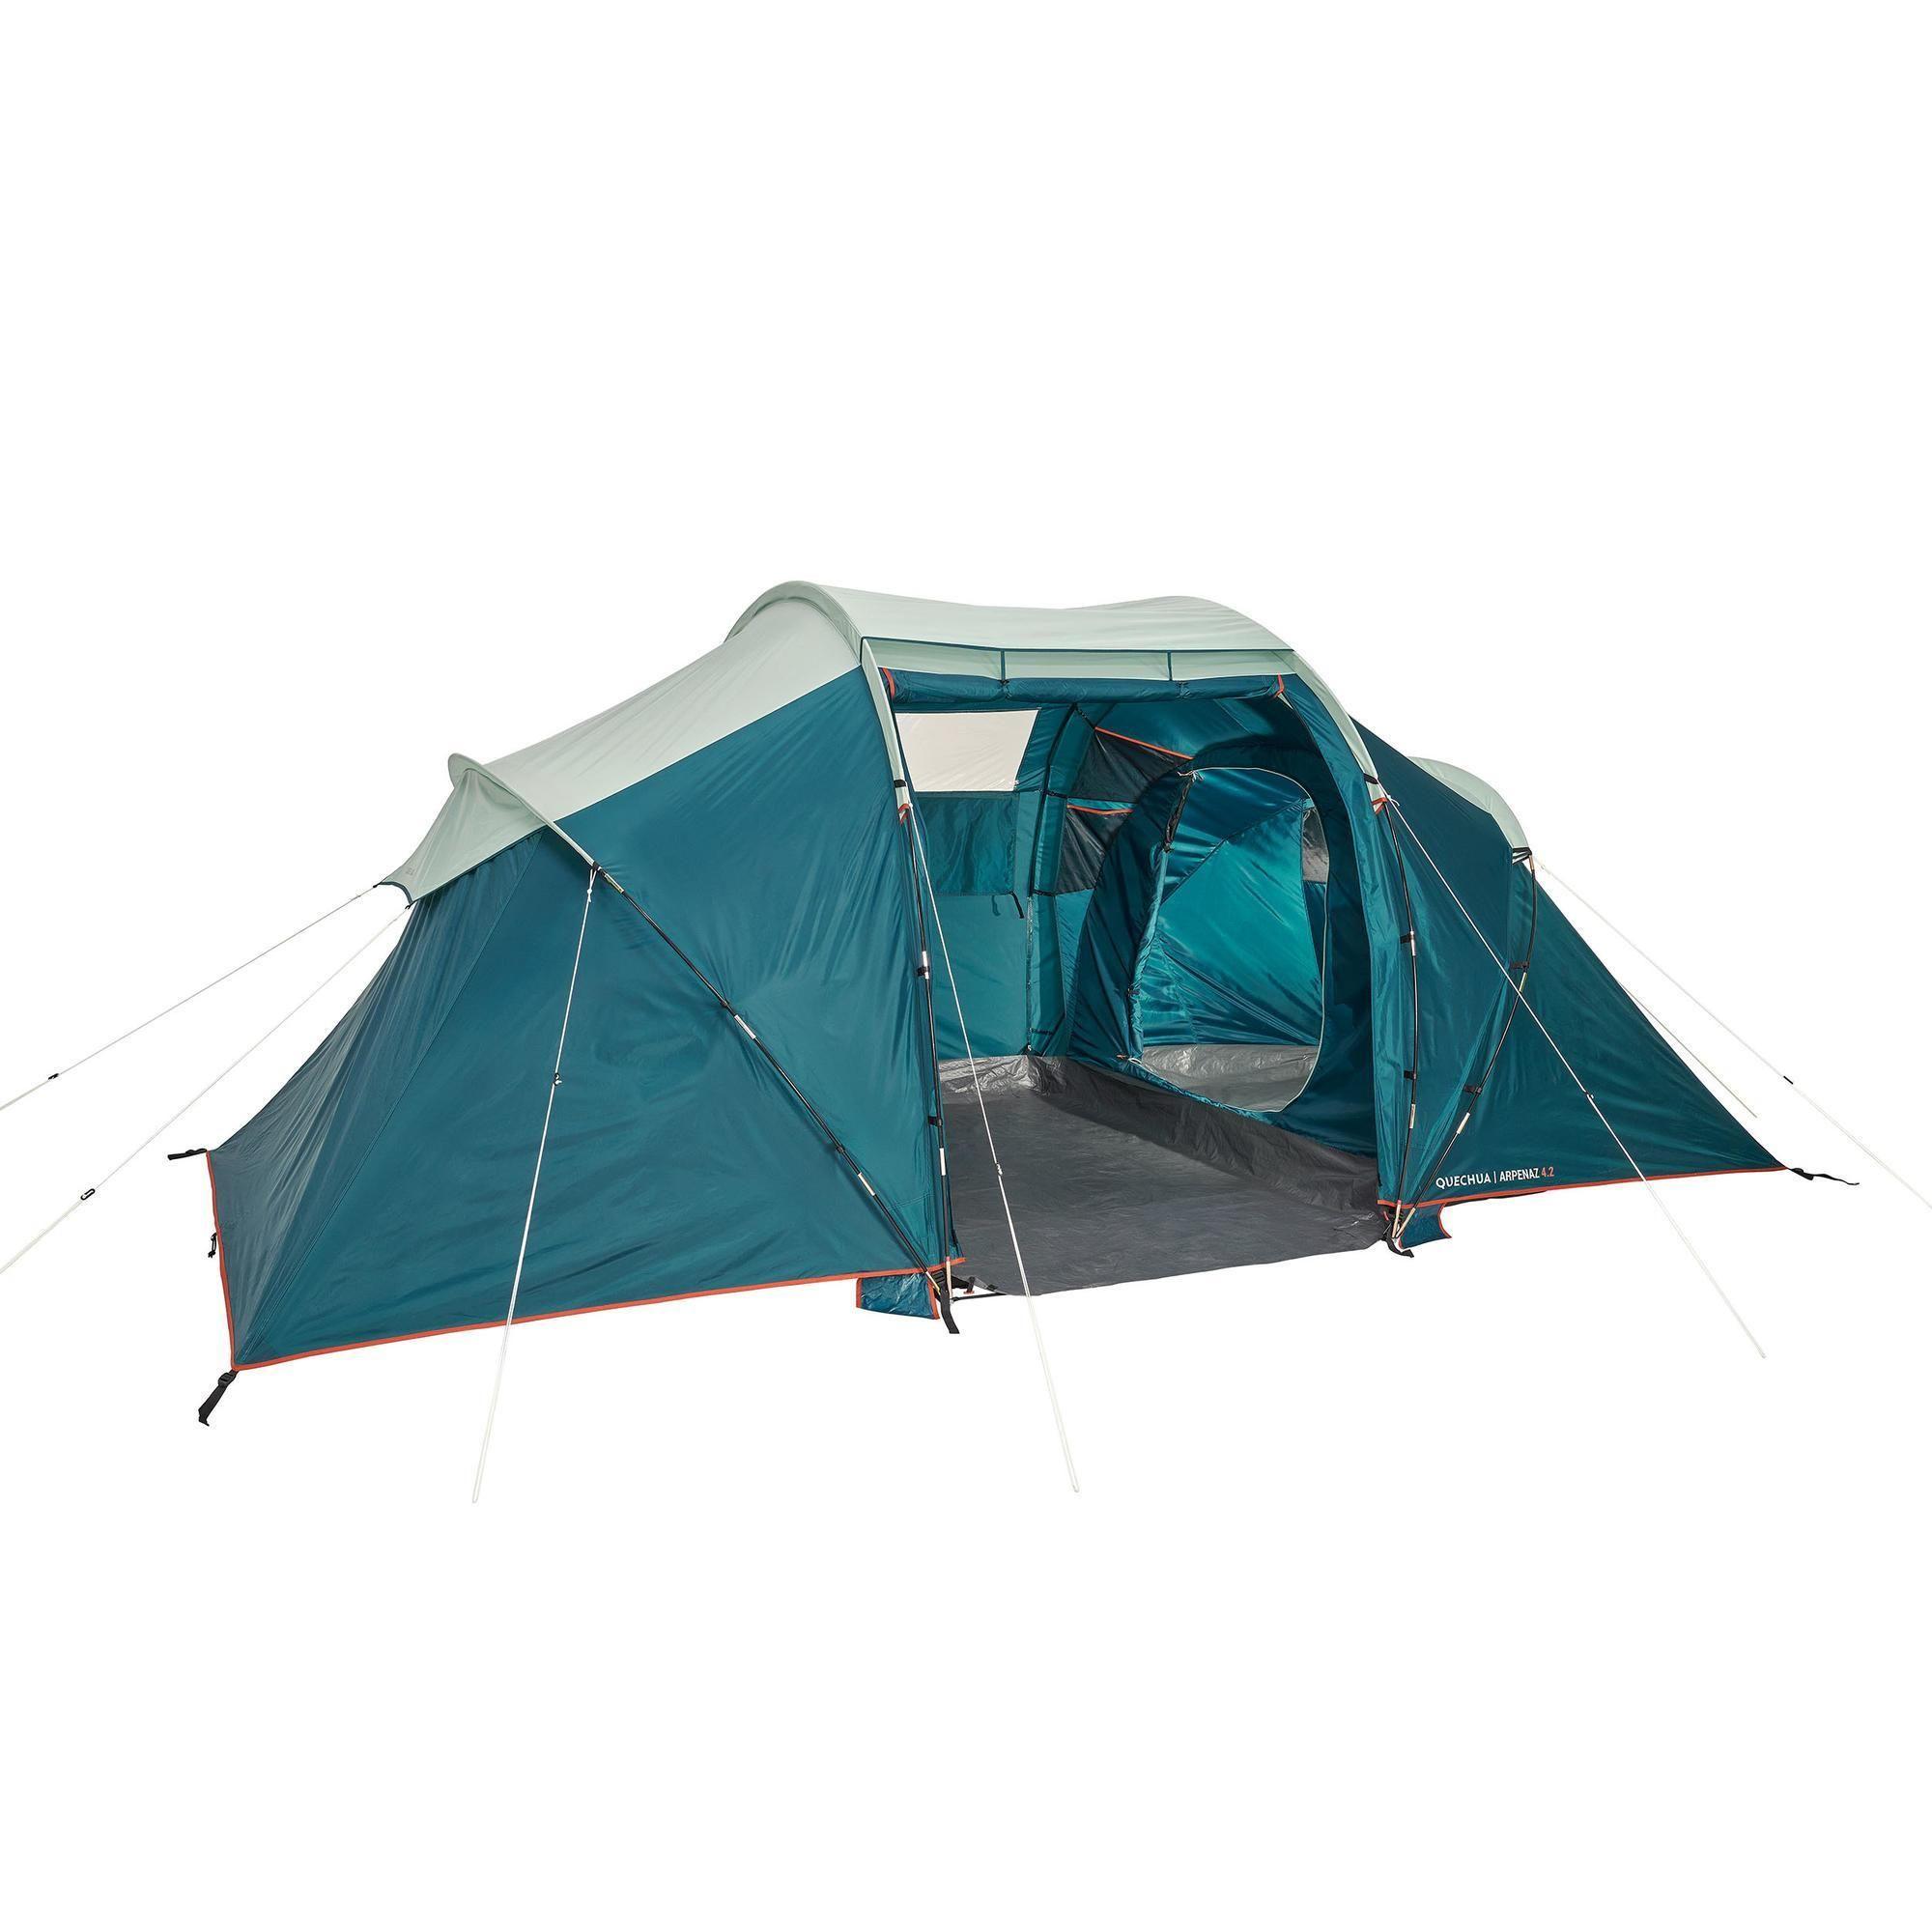 Tienda De Campaña Familiar Camping Quechua Arpenaz 4 2 4 Personas Upf30 Tent Kamperen Opbergzak